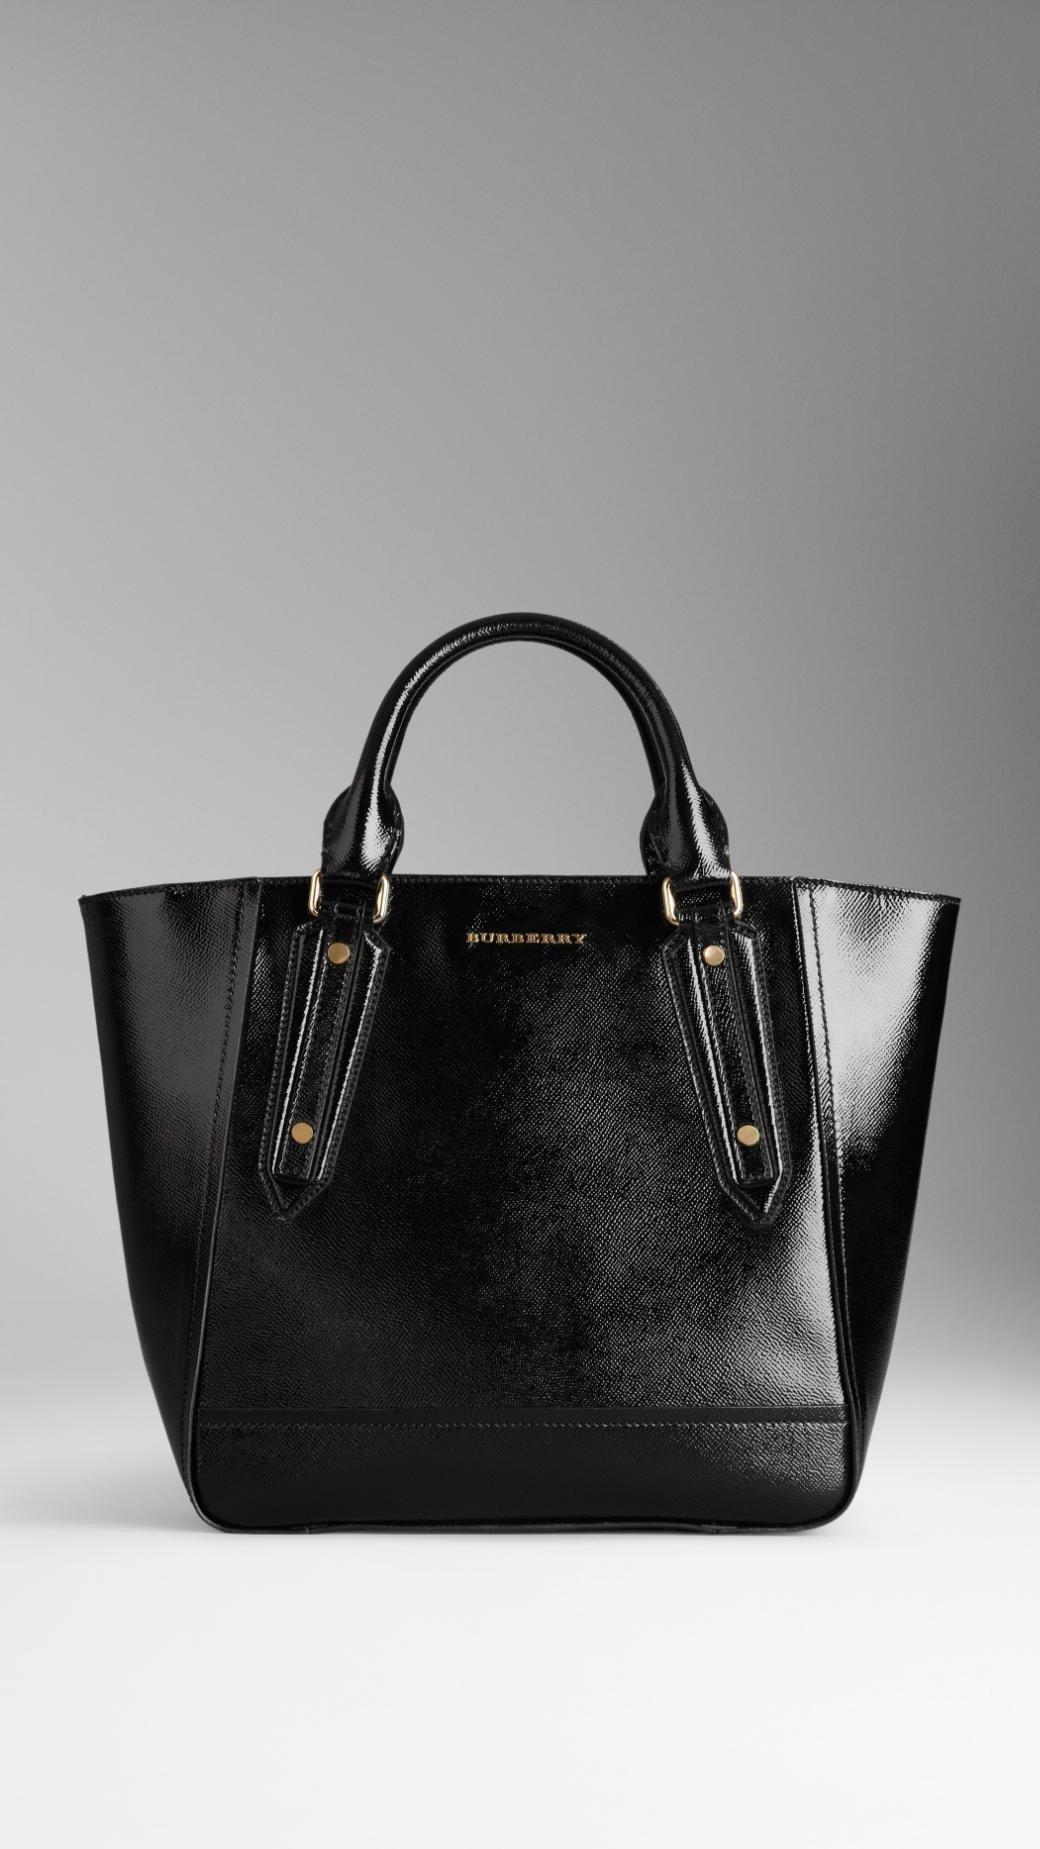 d3584cb1593 Lyst - Burberry Medium Patent London Leather Tote Bag in Black